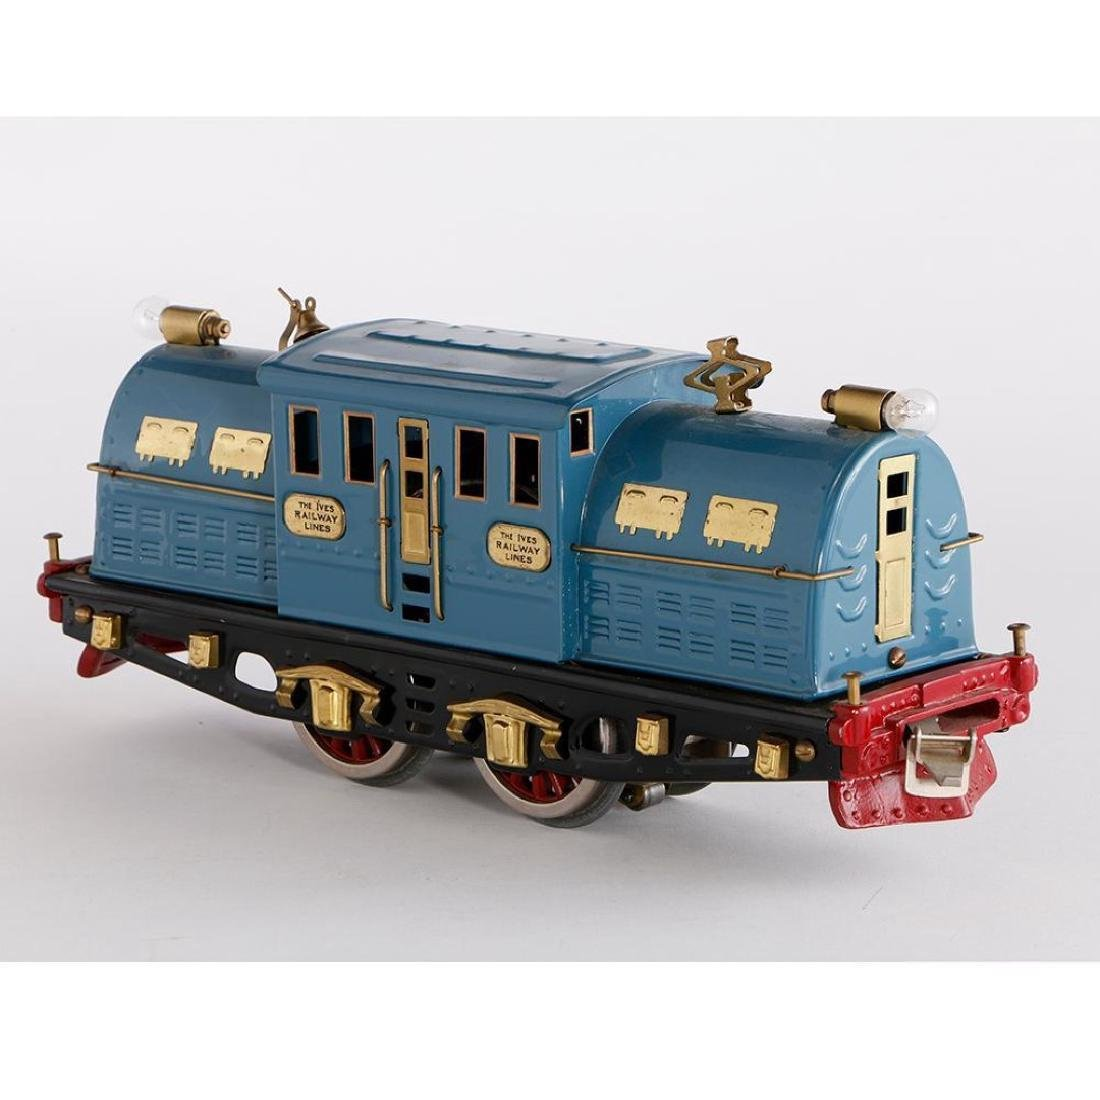 Rich-Art Reproduction Ives Standard Gauge Locomotive - 2